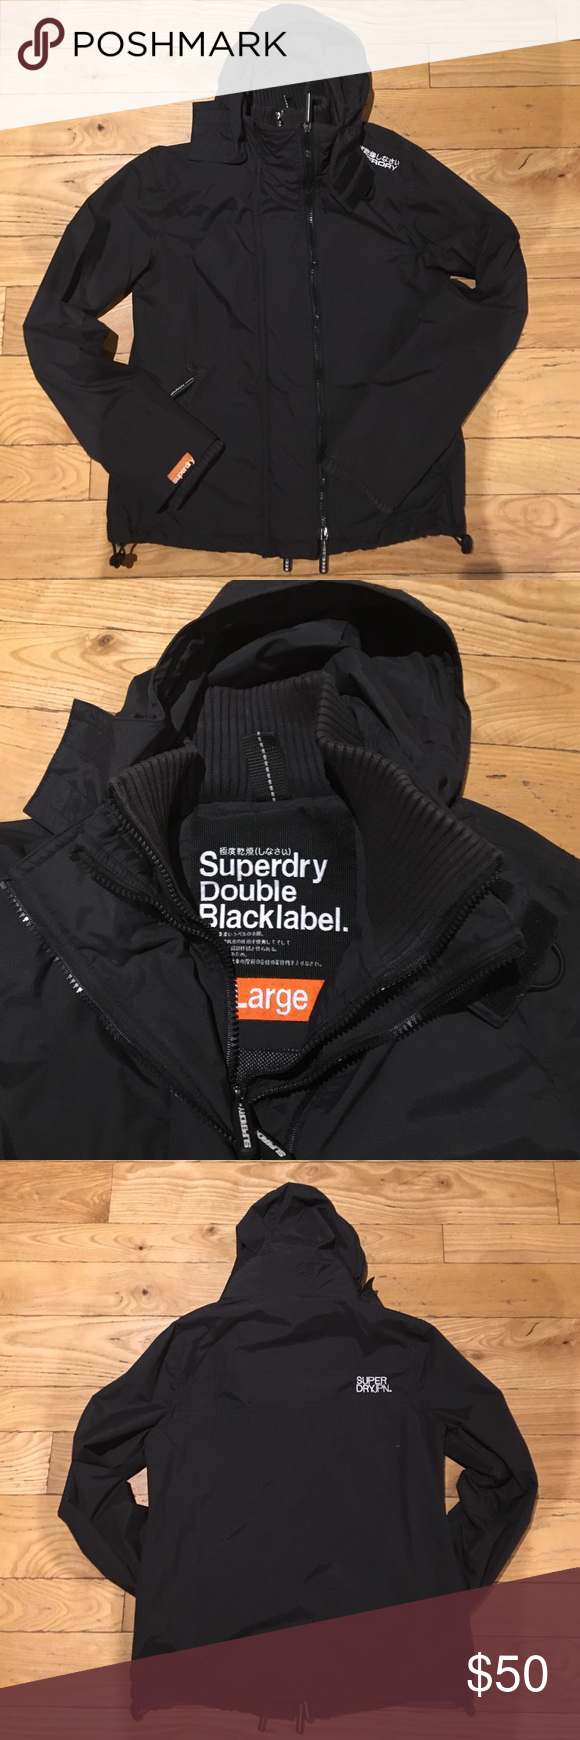 Superdry Women S Double Black Label Jacket Jackets Superdry Jackets Superdry [ 1740 x 580 Pixel ]